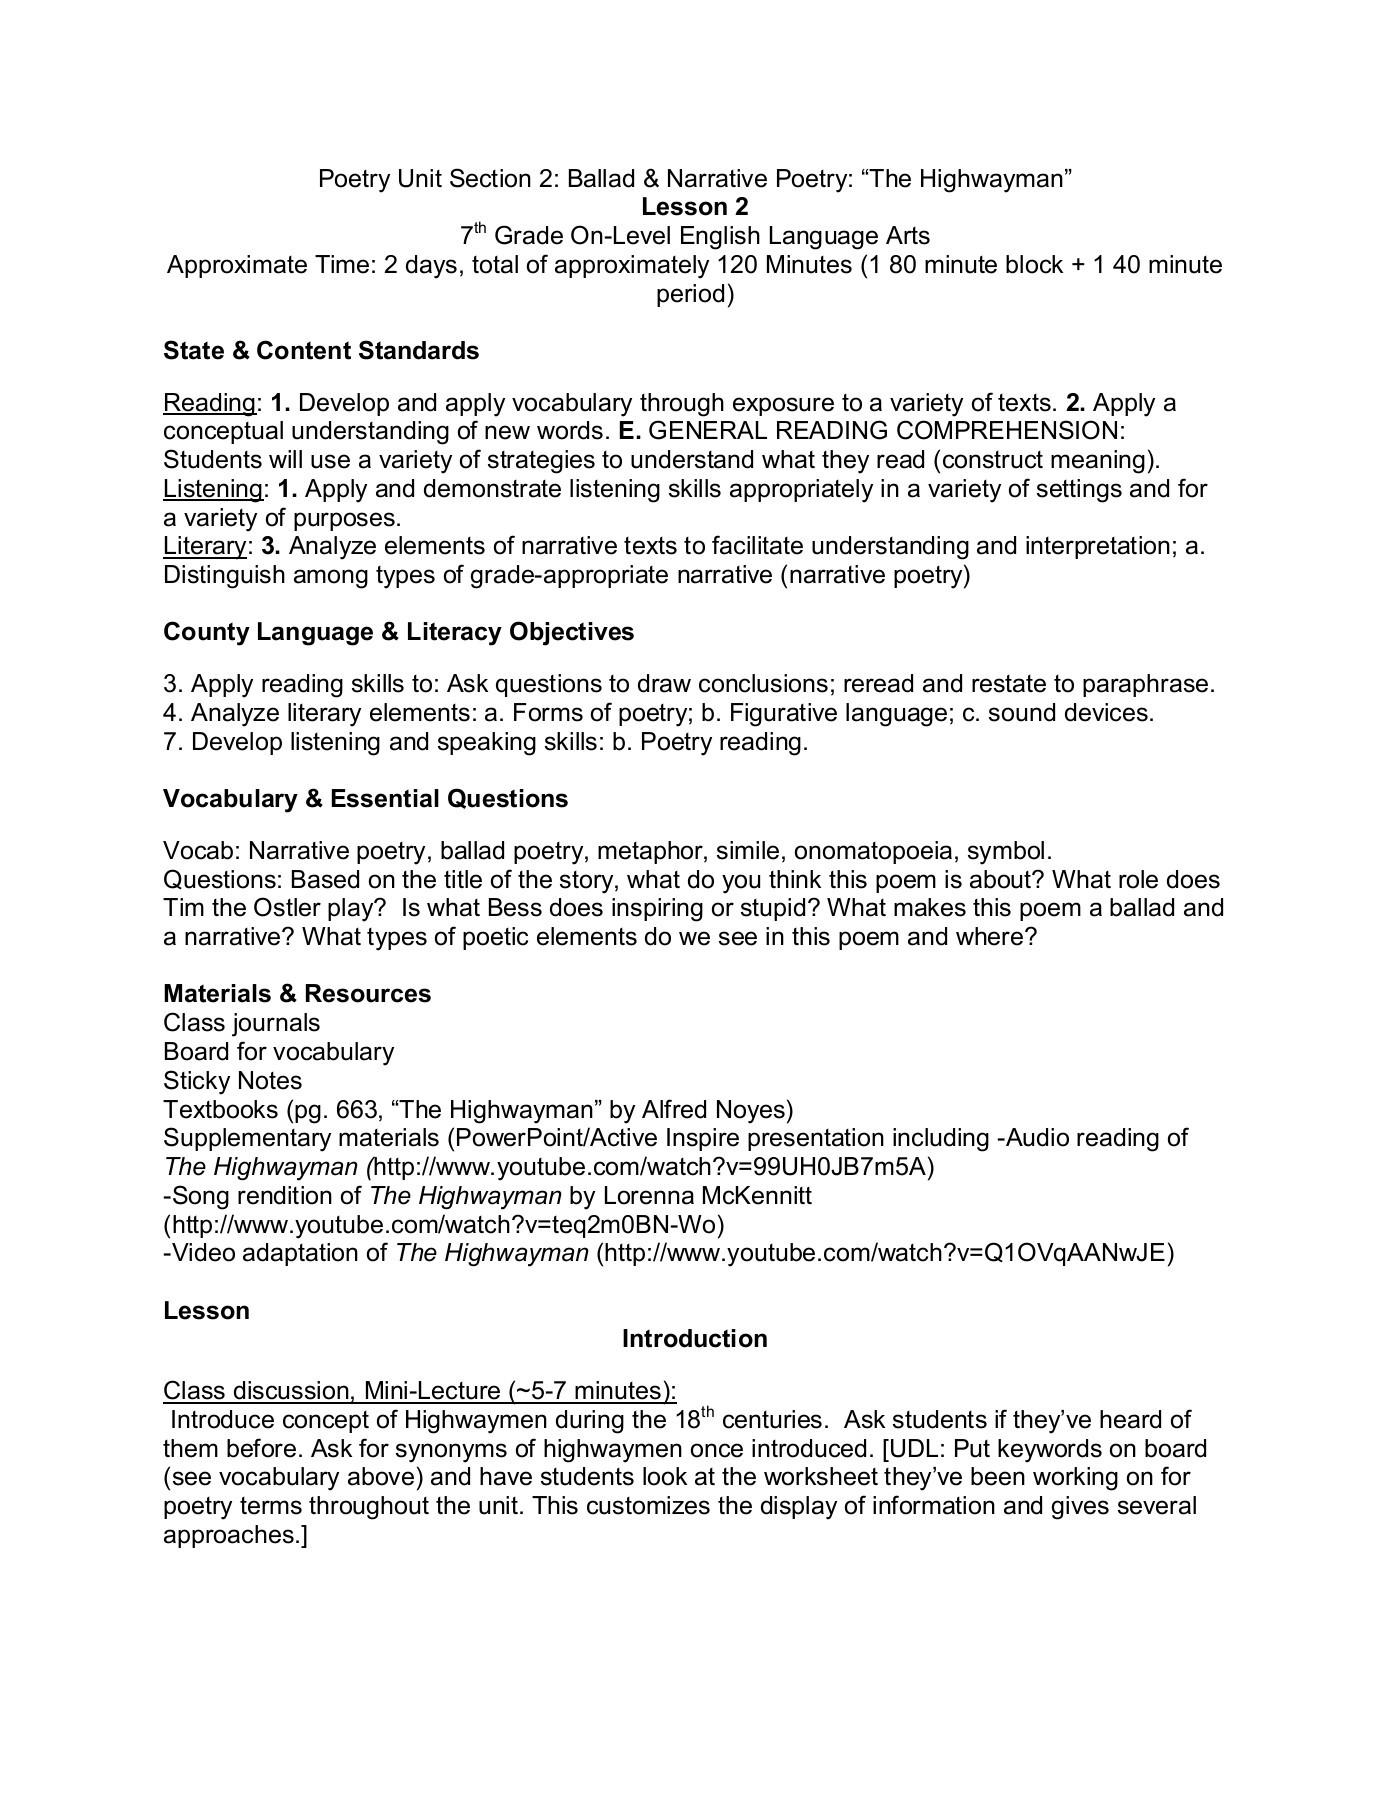 7th Grade Onomatopoeia Worksheets